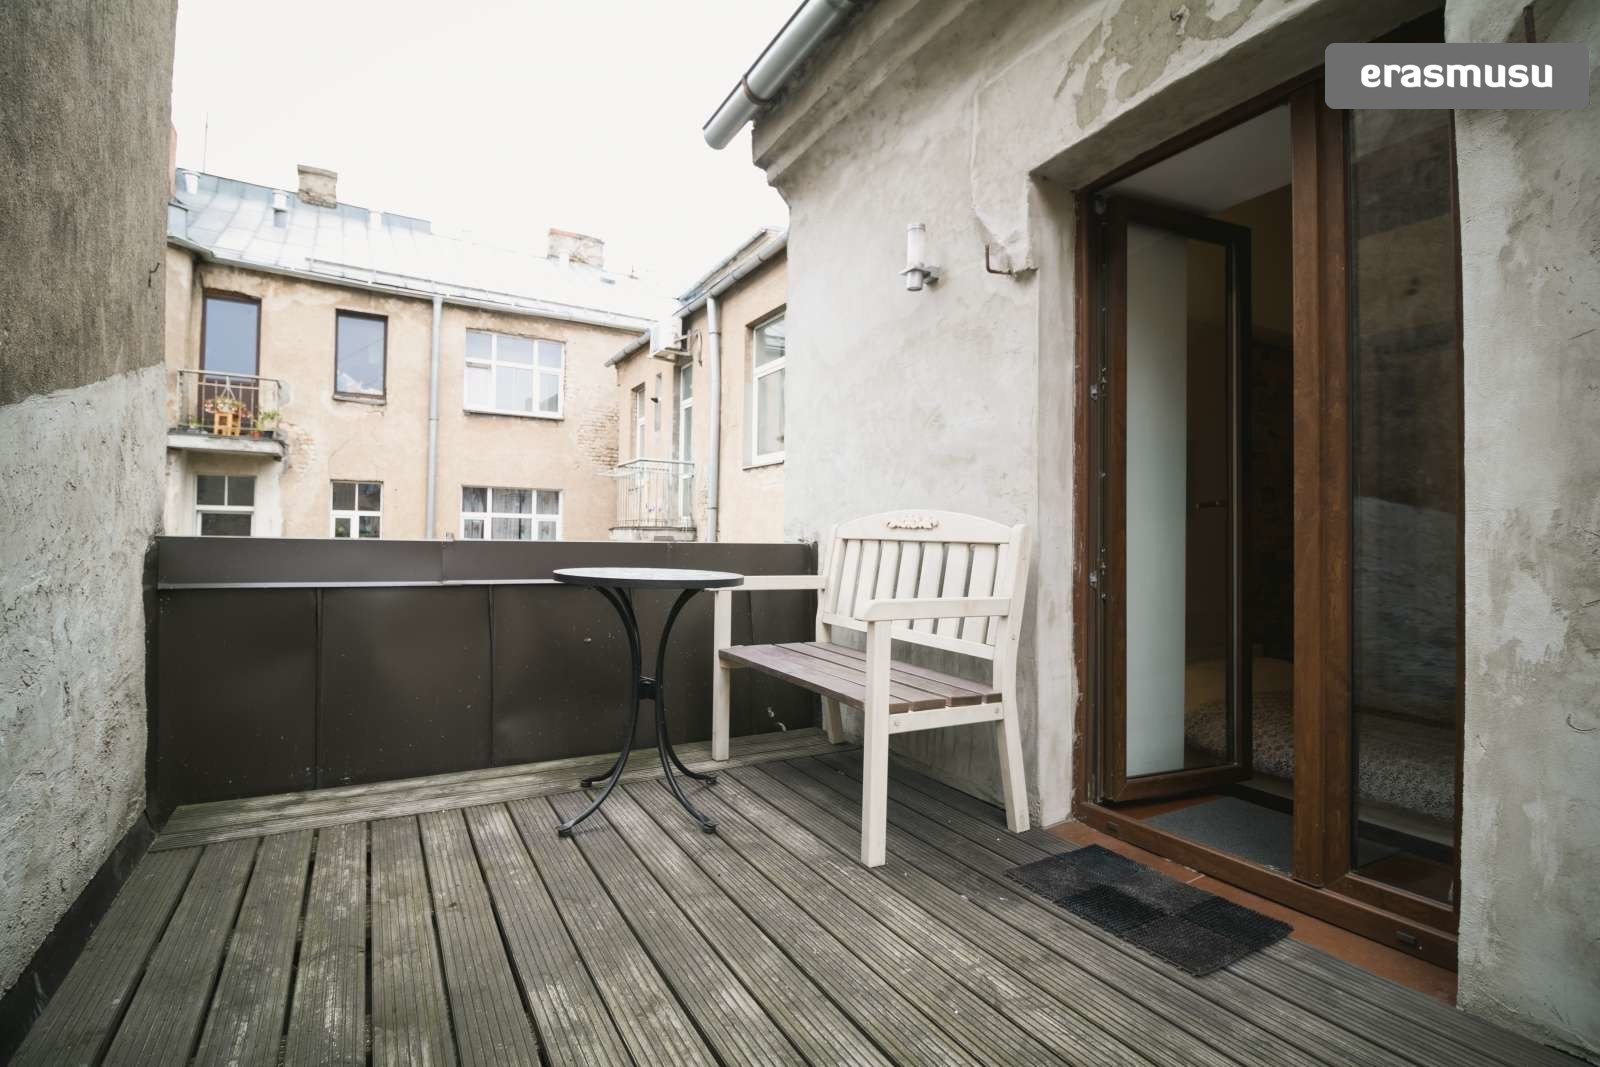 modern-studio-apartment-rent-maskavas-forstate-343ac3d82371cc4ca